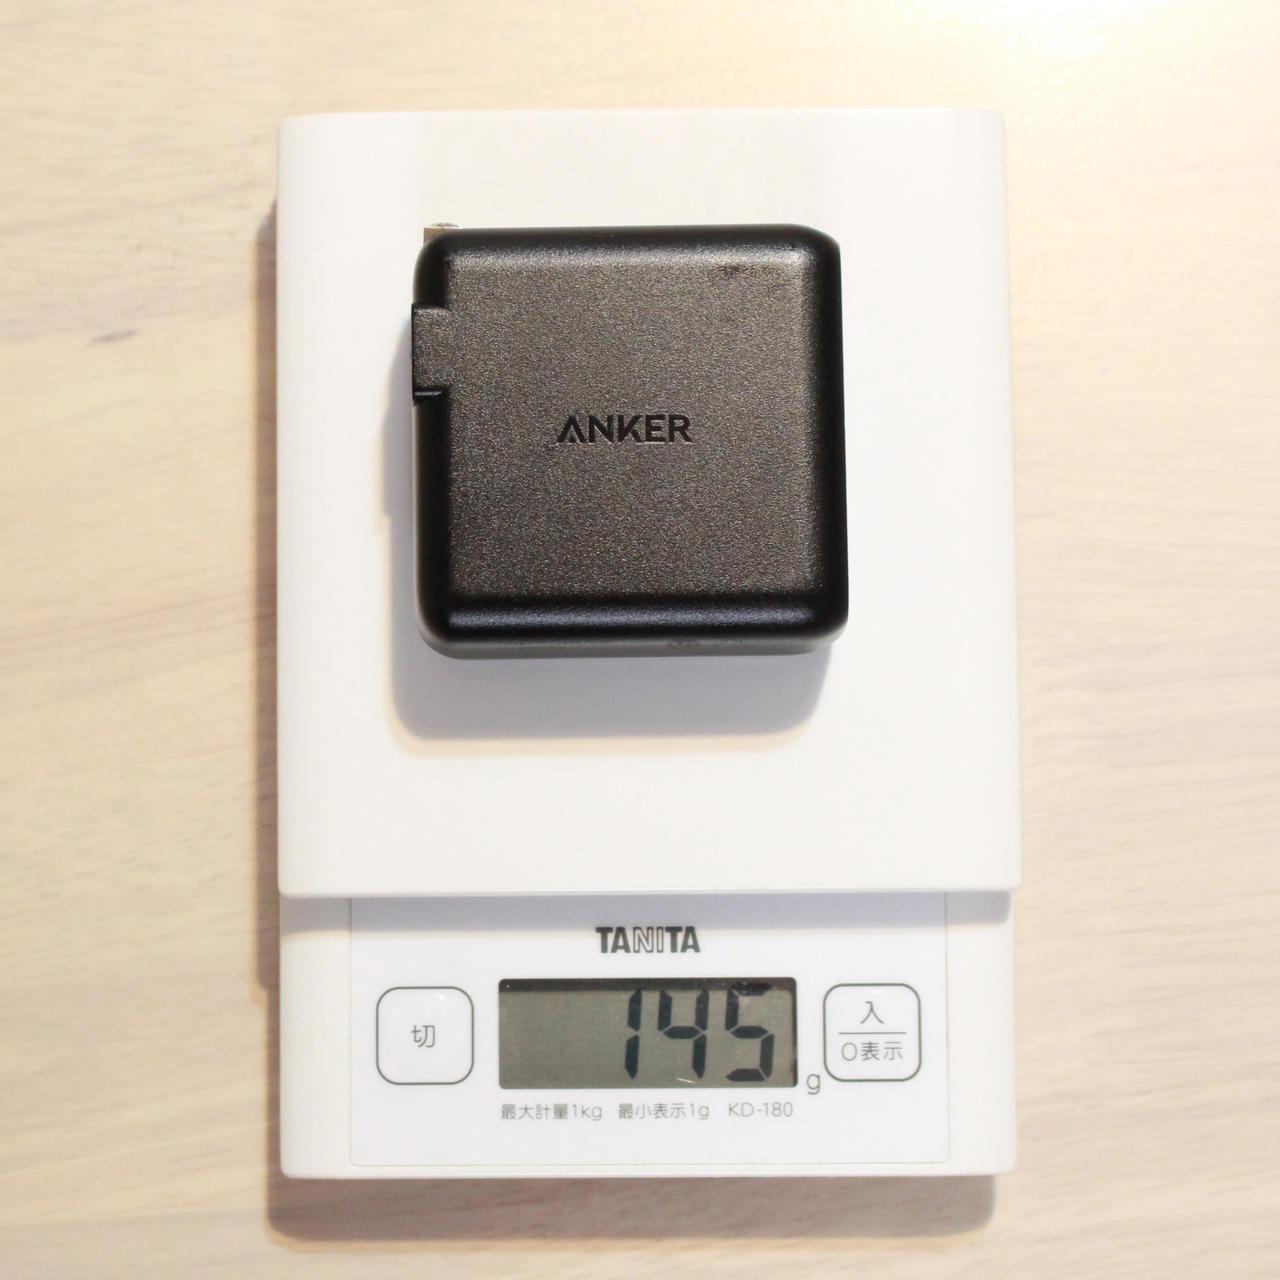 Anker PowerPort Speed 1 PD 60は145g